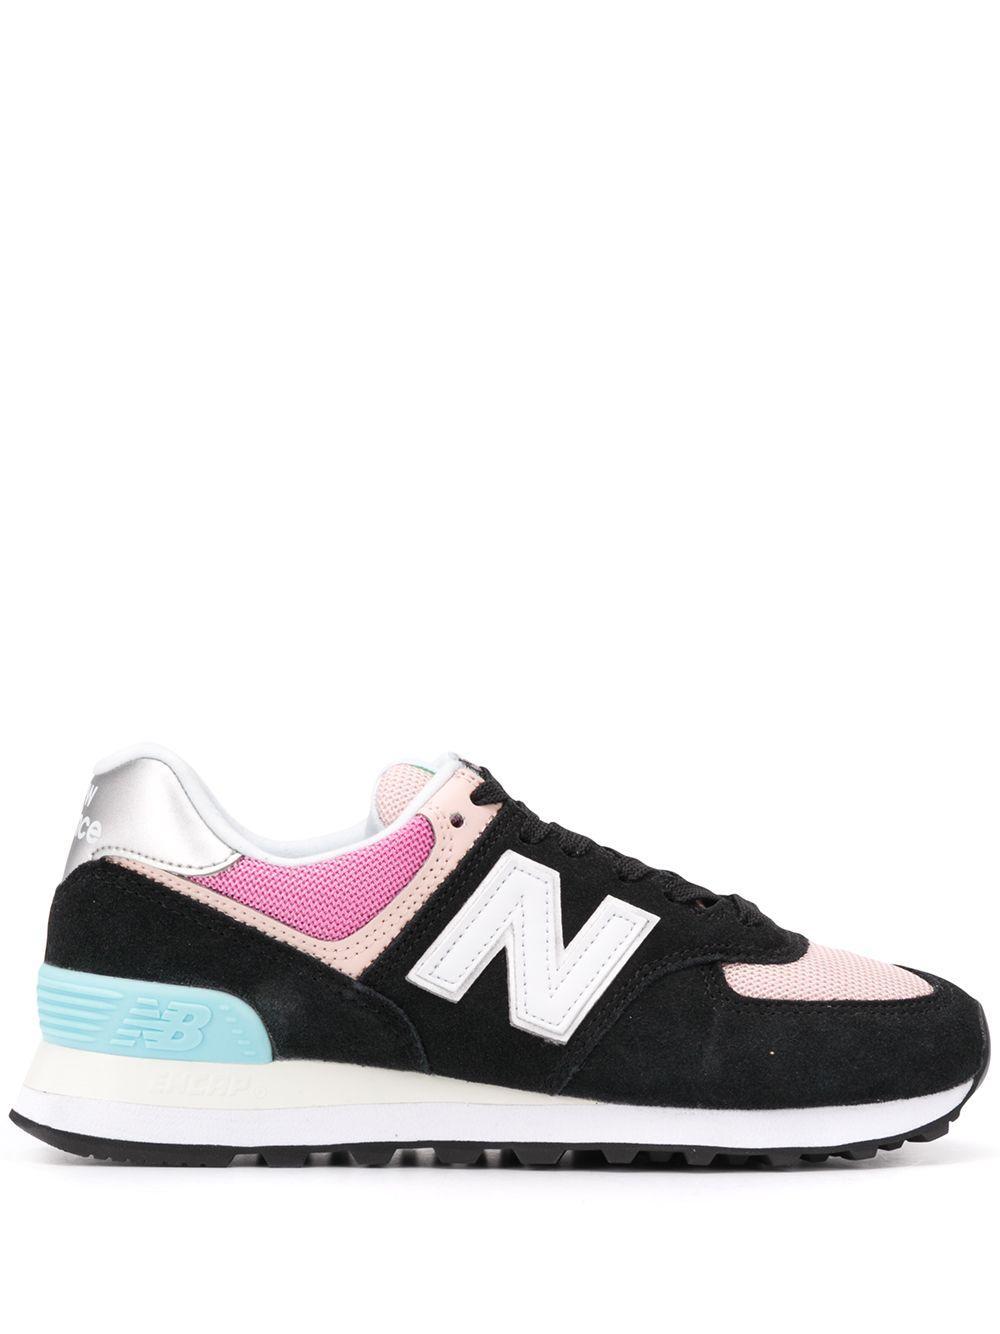 New Balance 574 in Black/Pink (Black) - Lyst